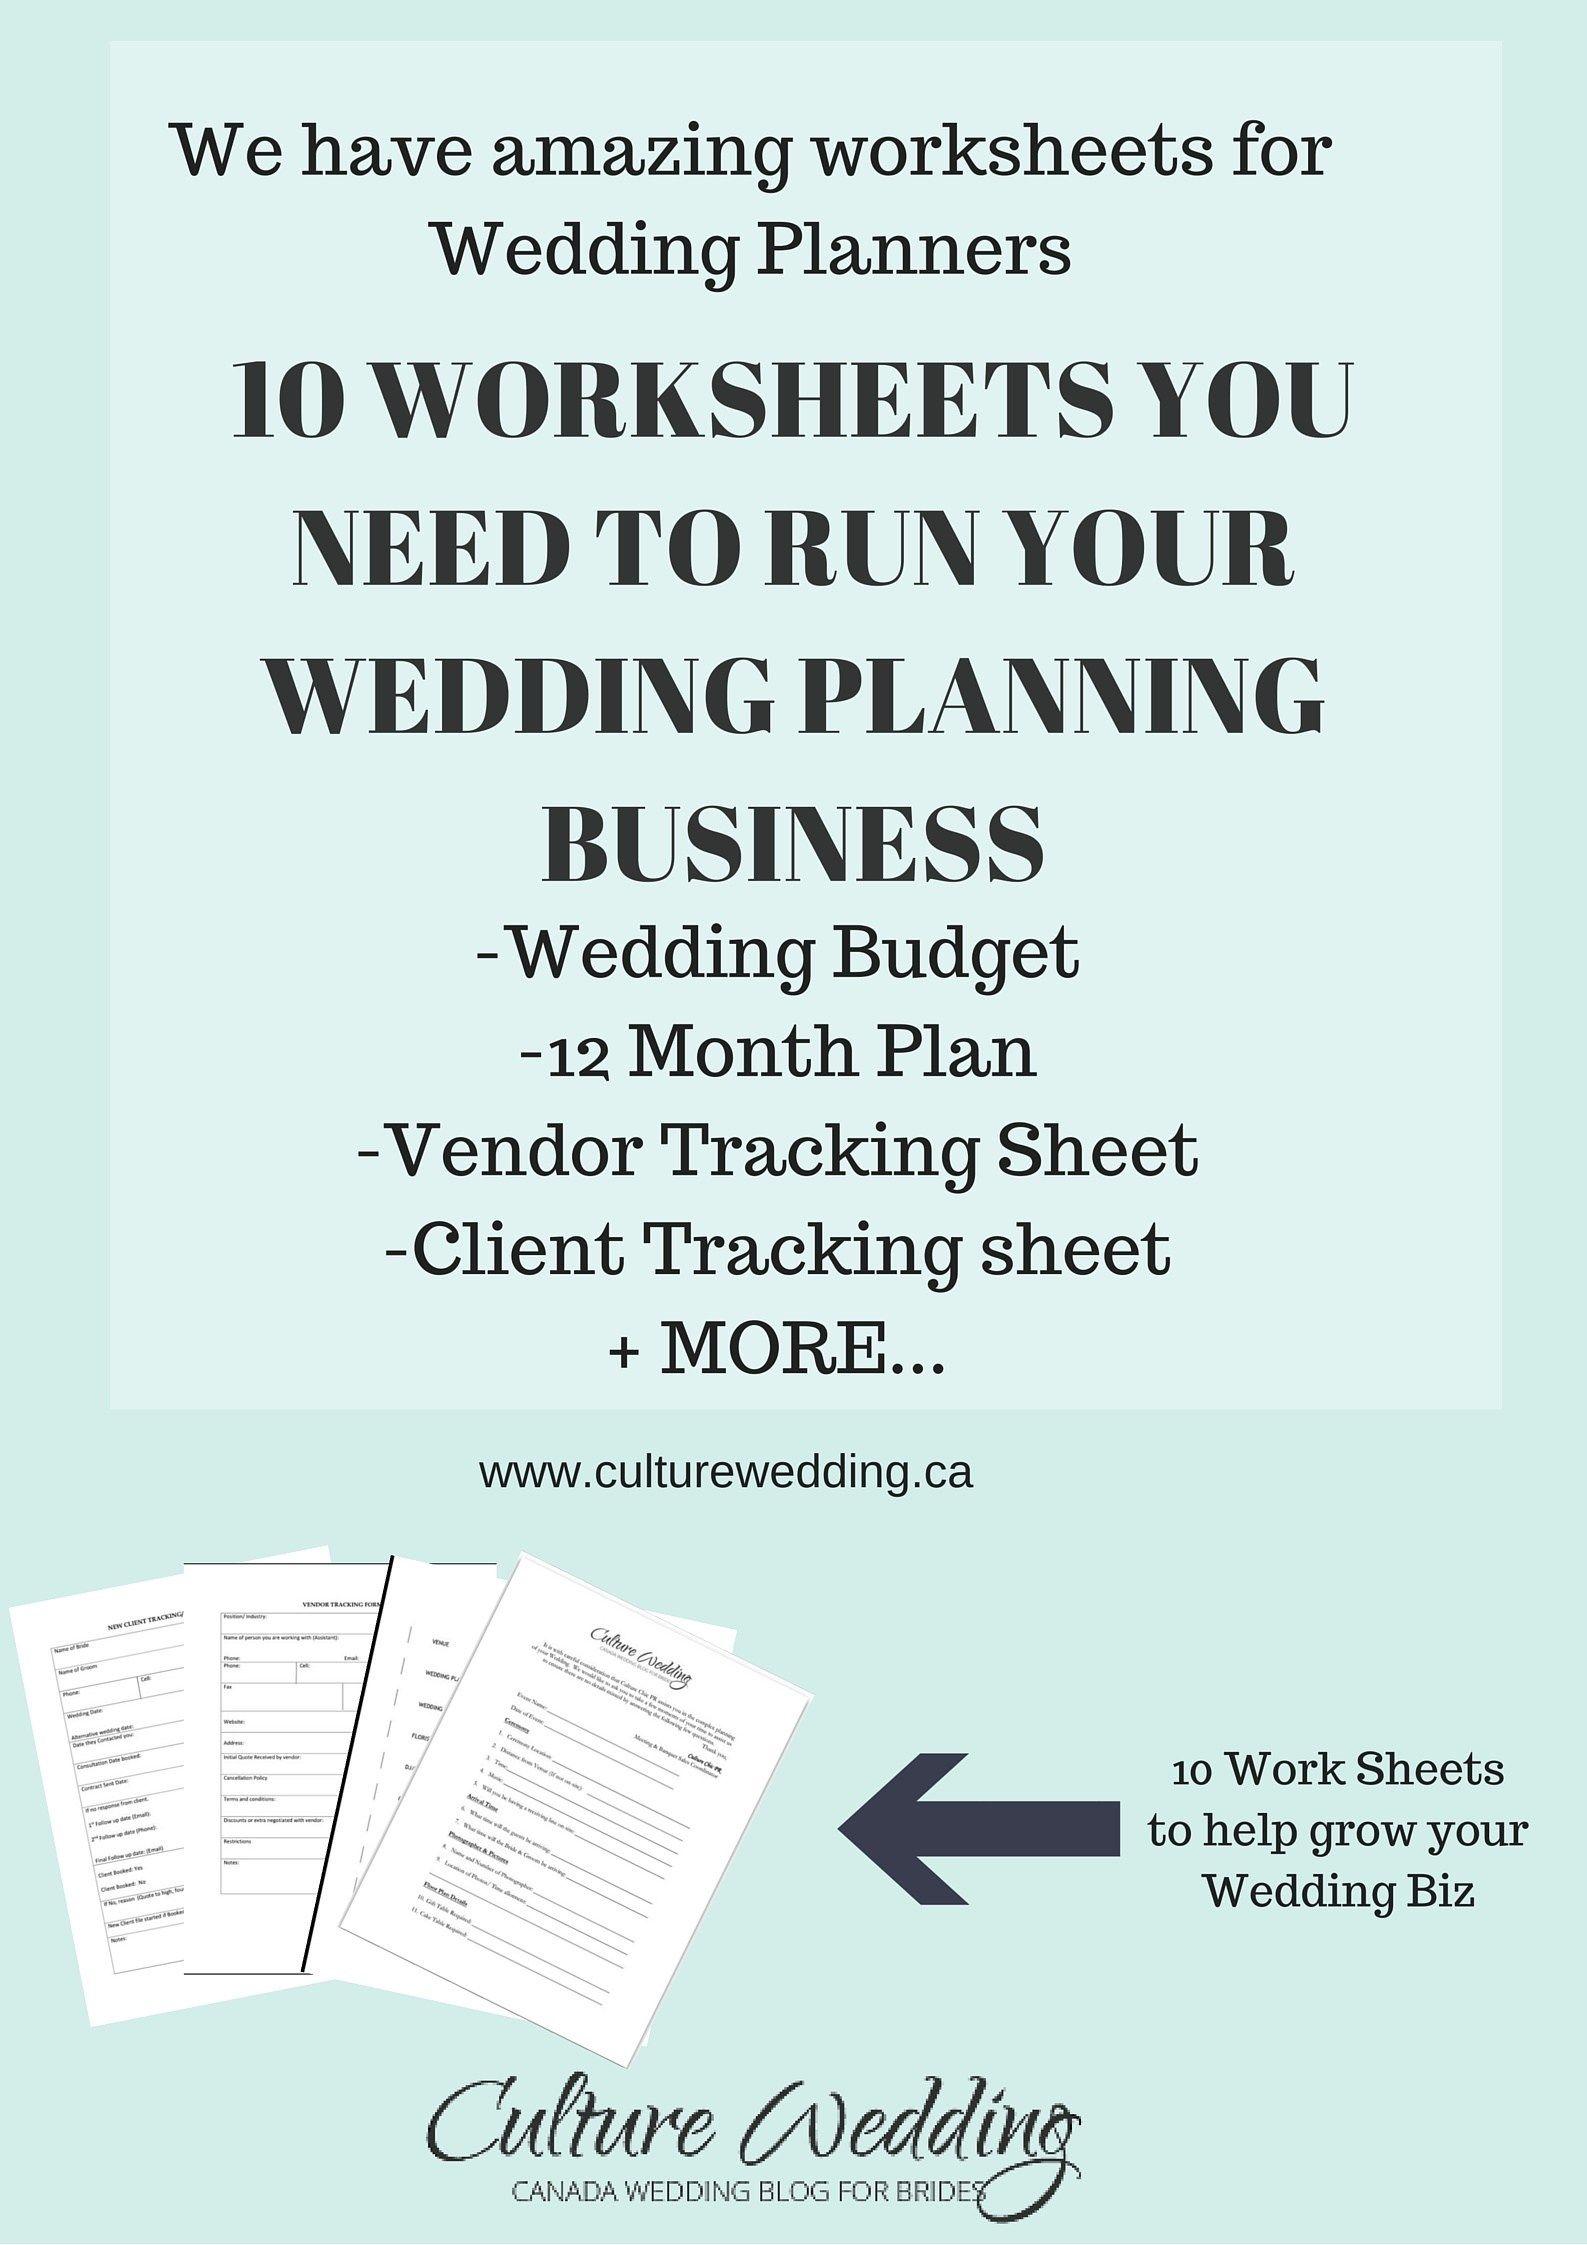 10 Work Sheets To Grow Your Wedding Biz 1 587 2 245